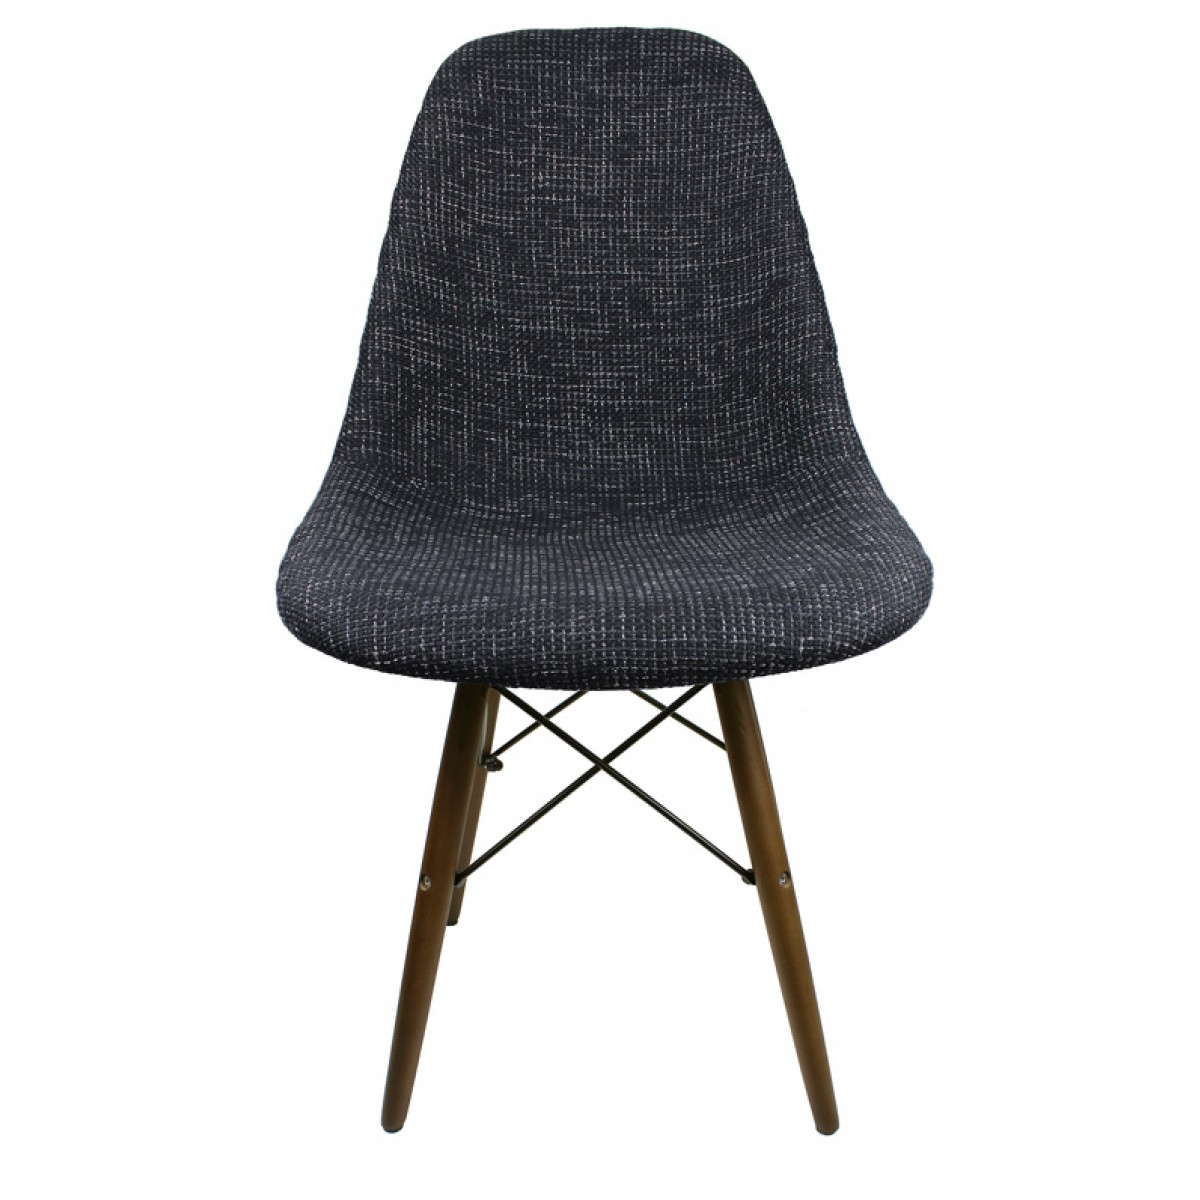 Black Fabric Upholstered Accent Chair With Dark Walnut Wood Eiffel Legs